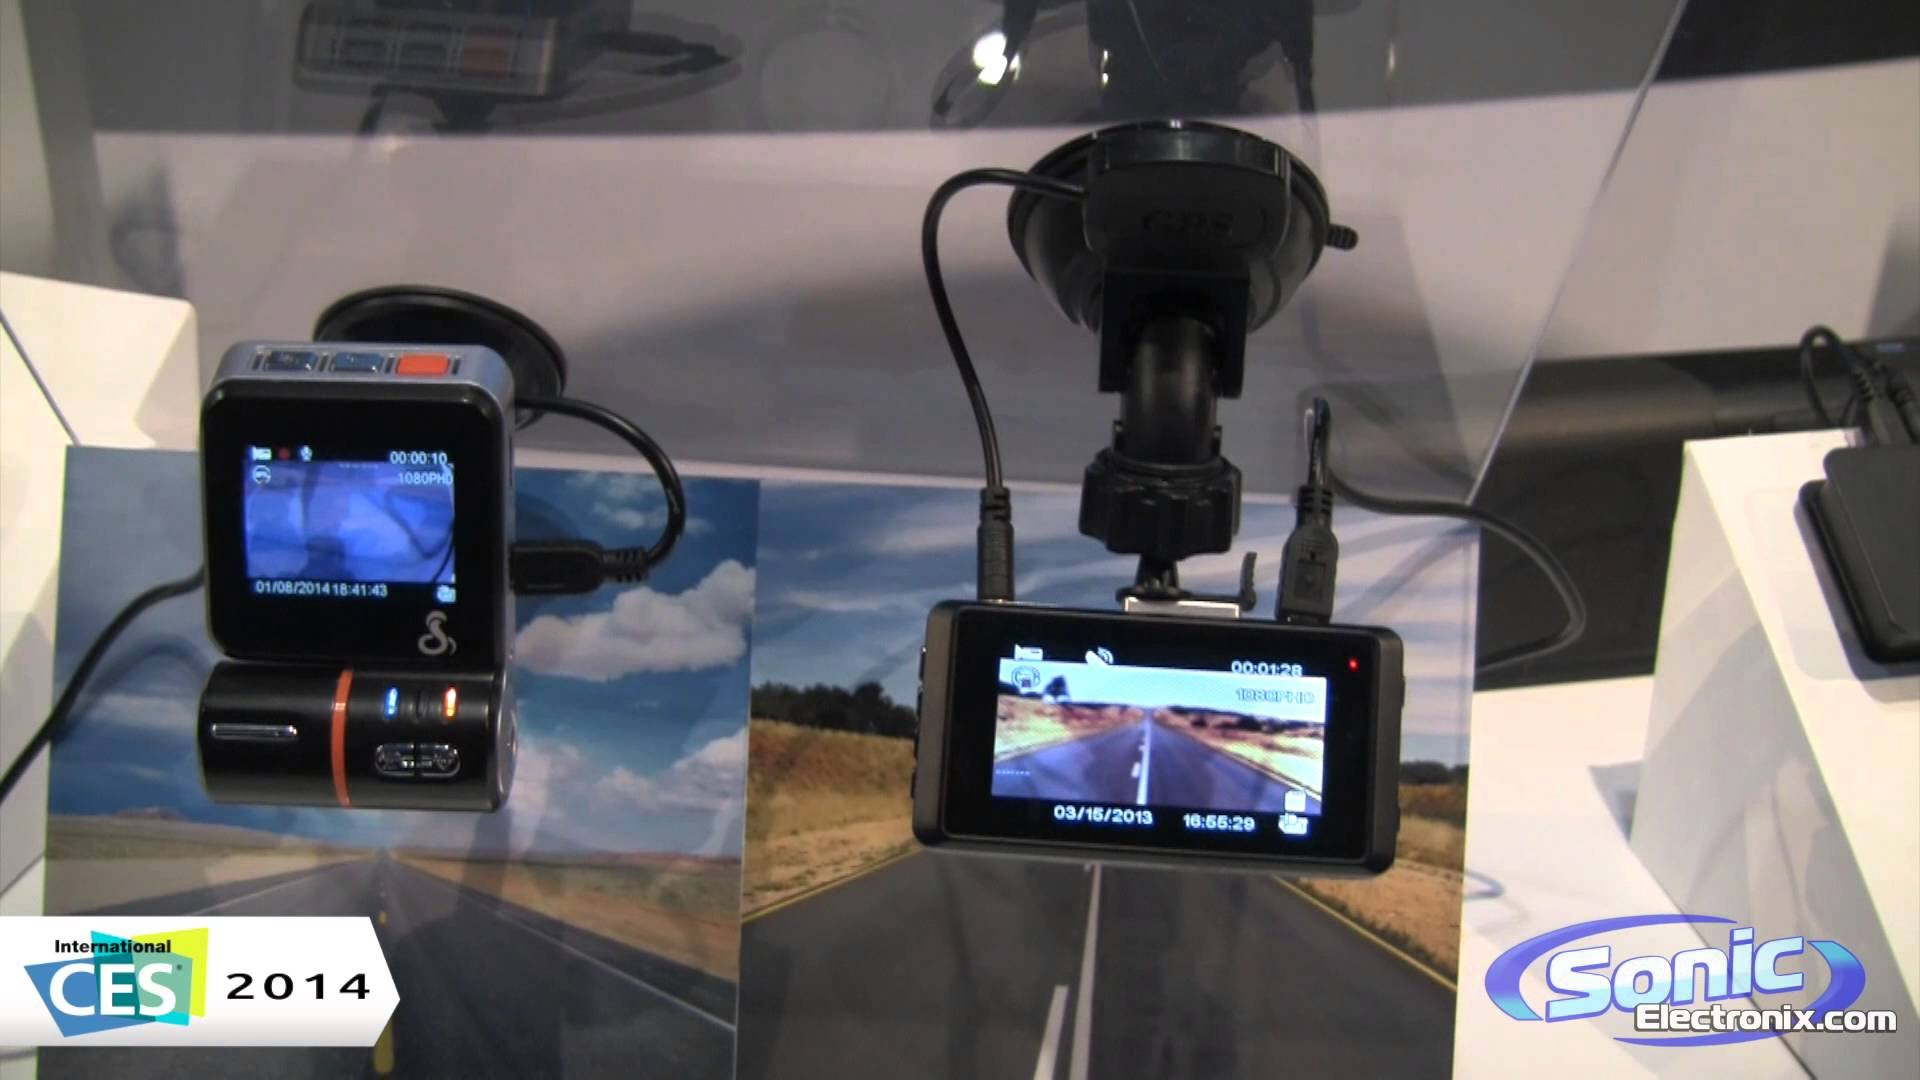 COBRA ELECTRONICS CDR830 1080P Pro Grade Dash Cam 12MP Cobra CDR810 & CDR830 Dash Cameras | CES 2014 - YouTube